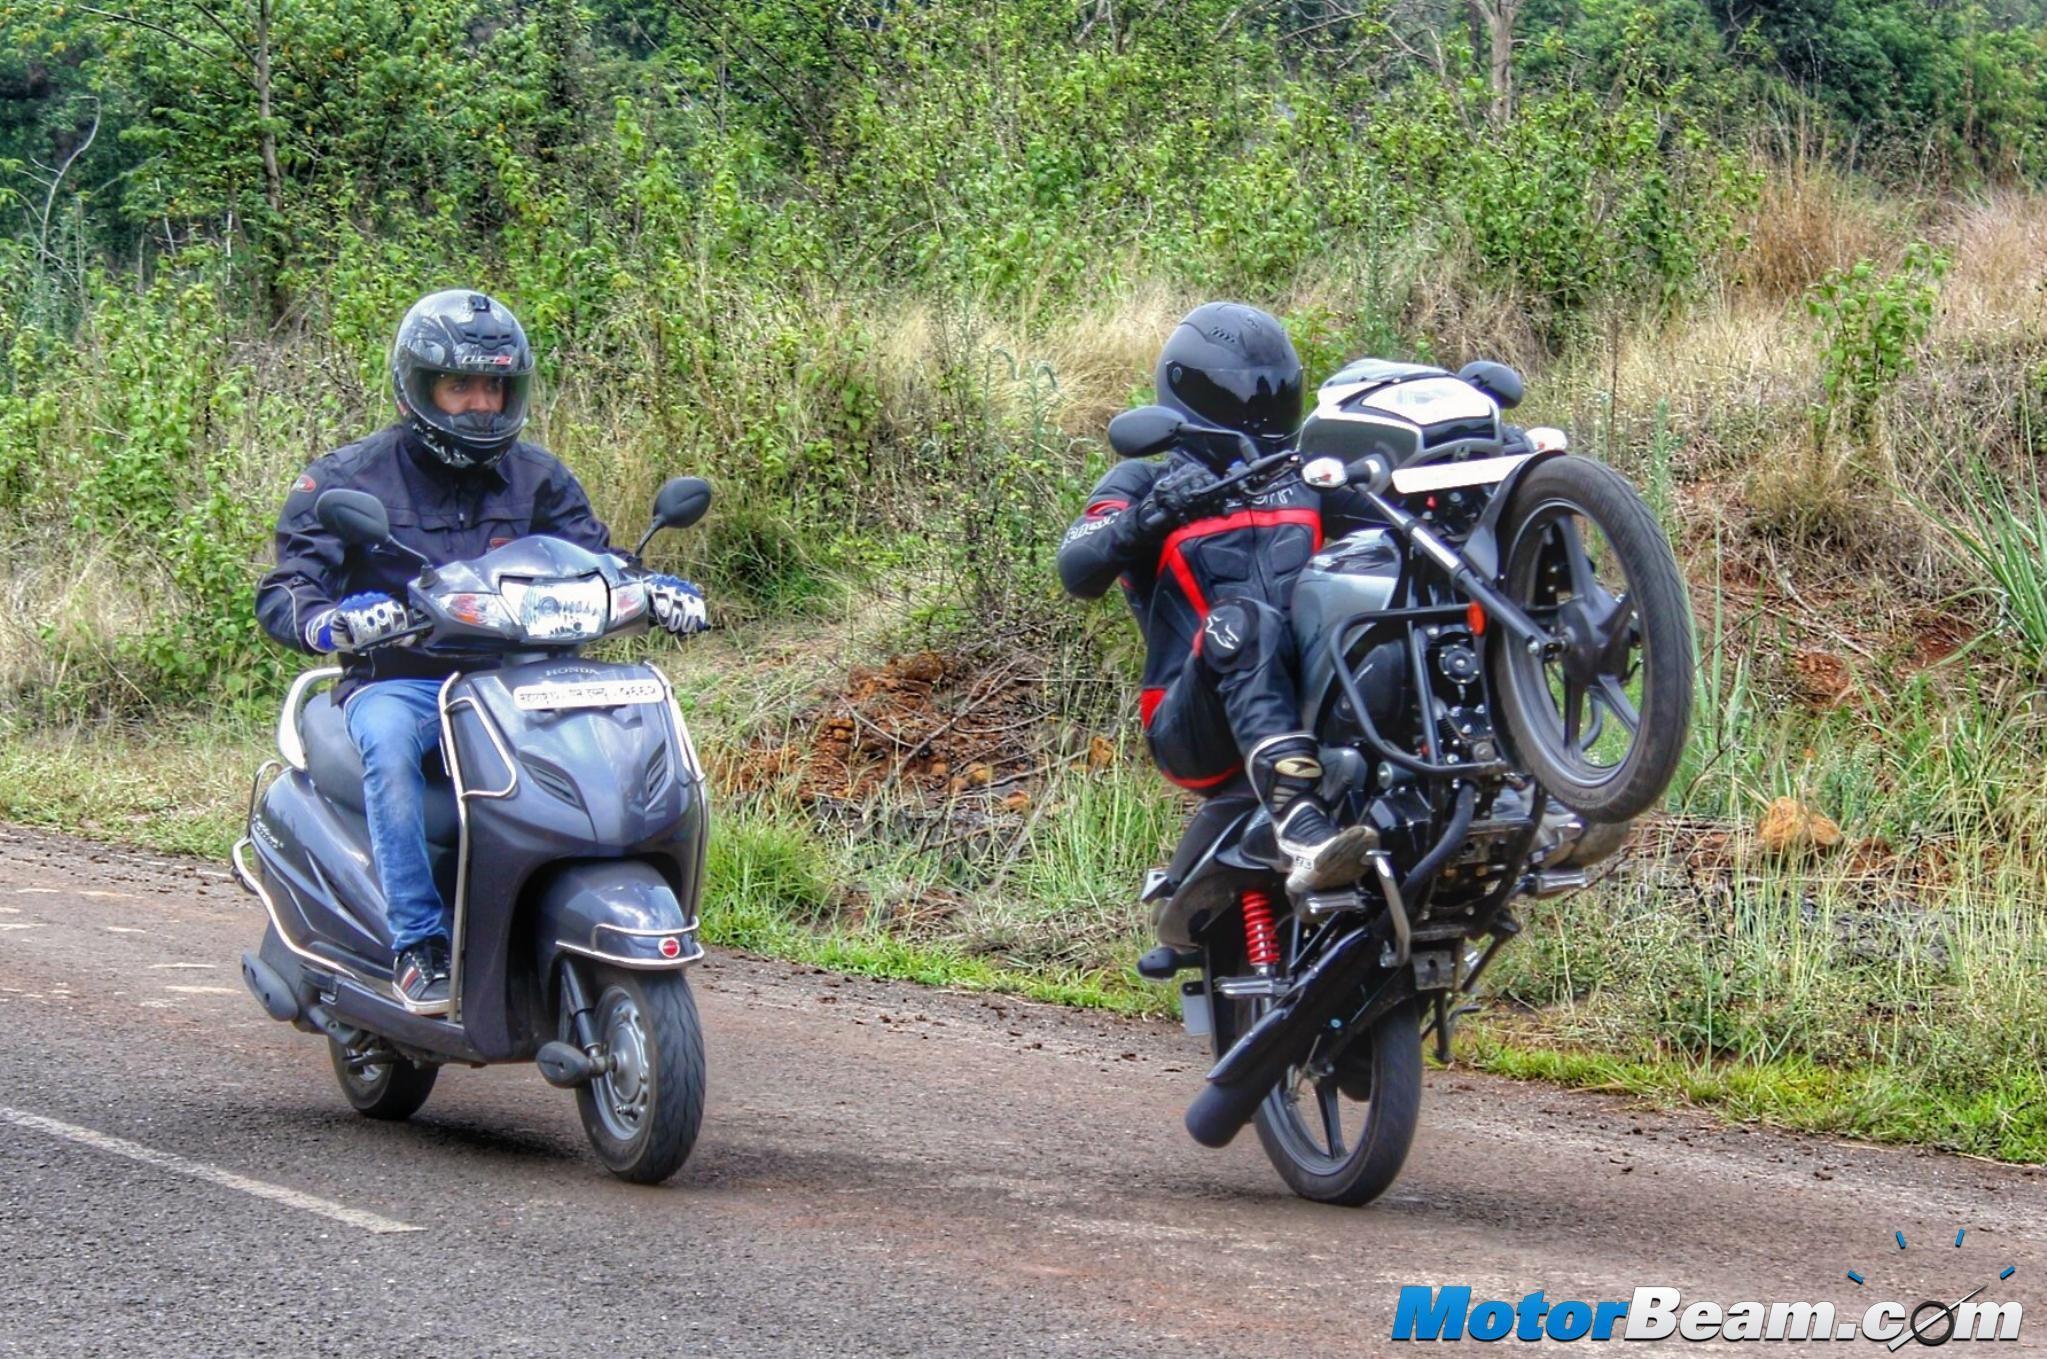 Honda Activa Touches 1 Crore Sales Milestone In India Bike India